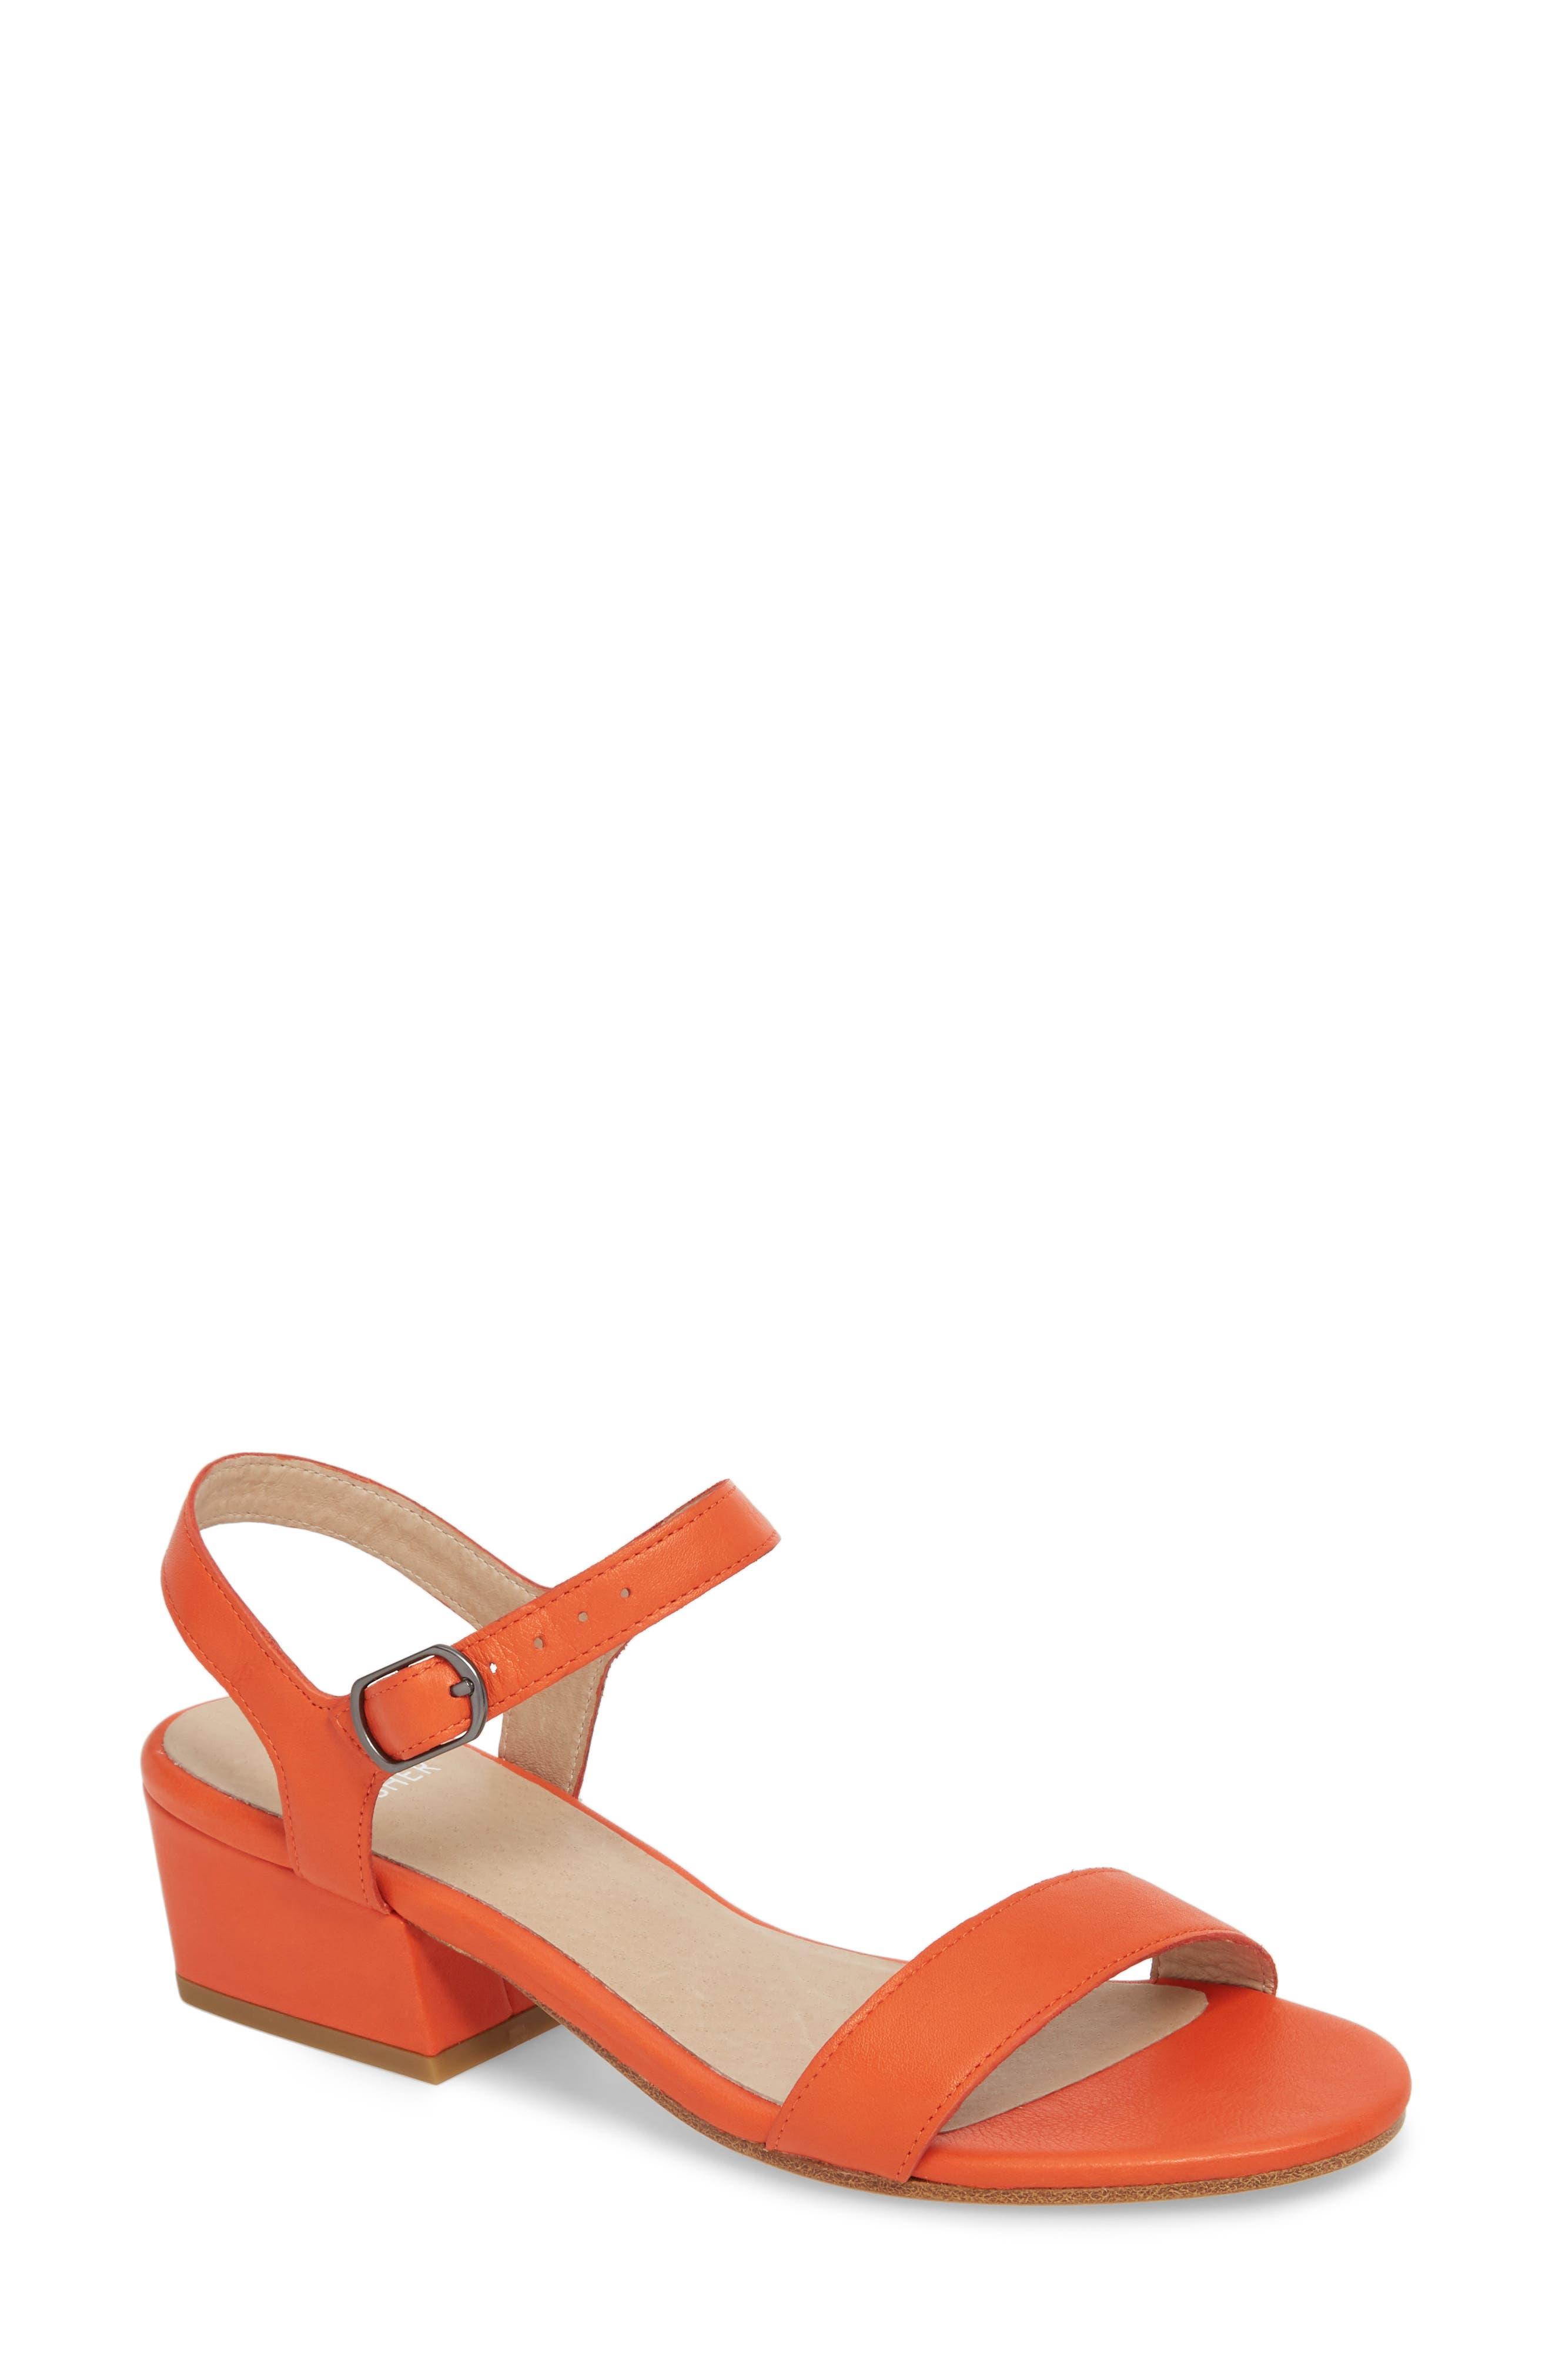 Olean Quarter Strap Sandal,                         Main,                         color, 800